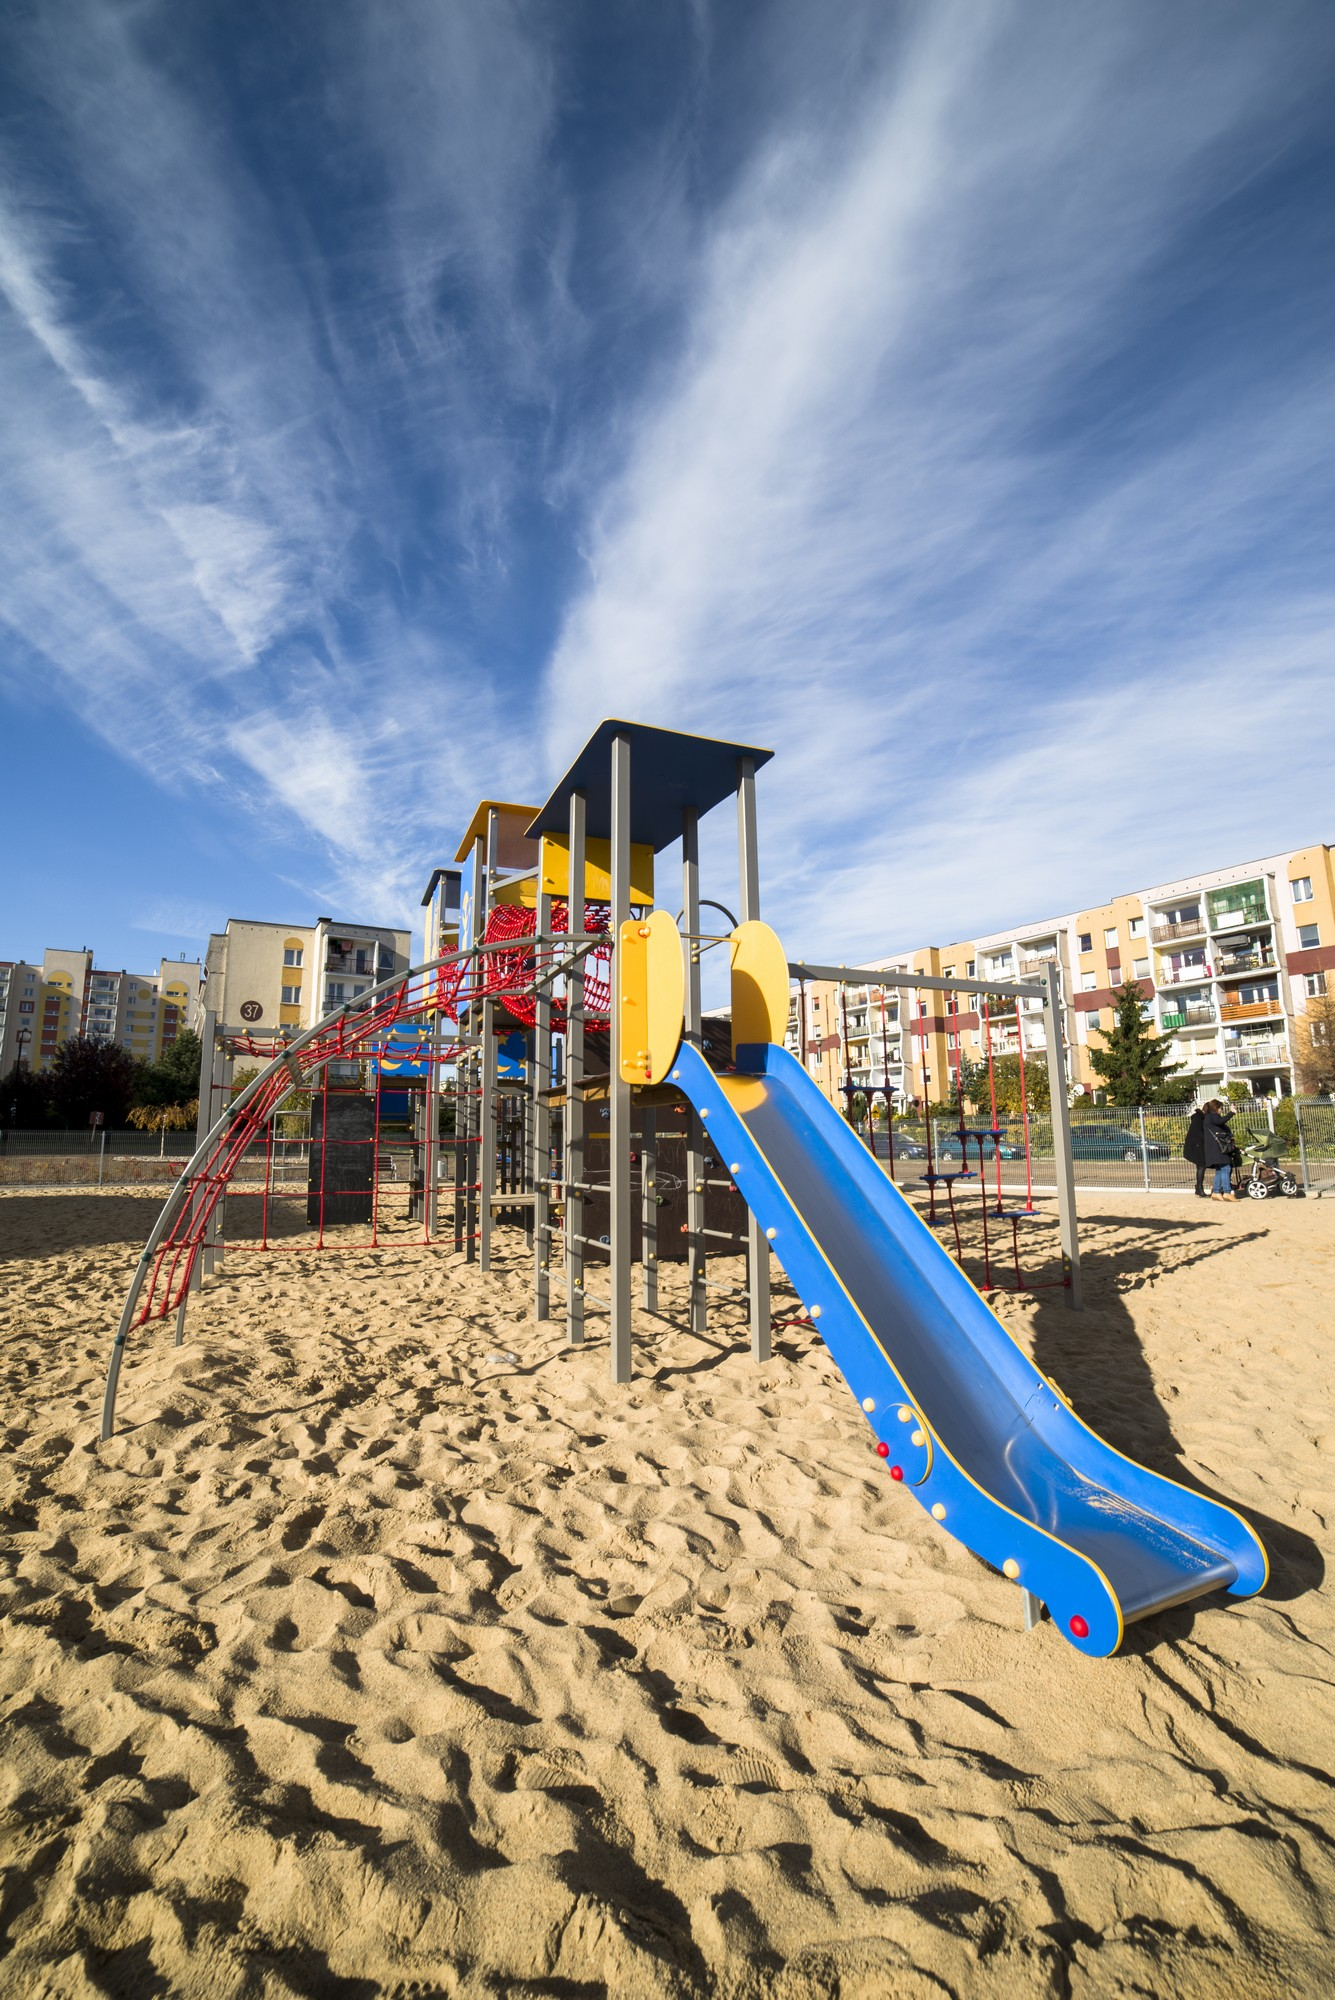 Blue Rumia Playground Slide